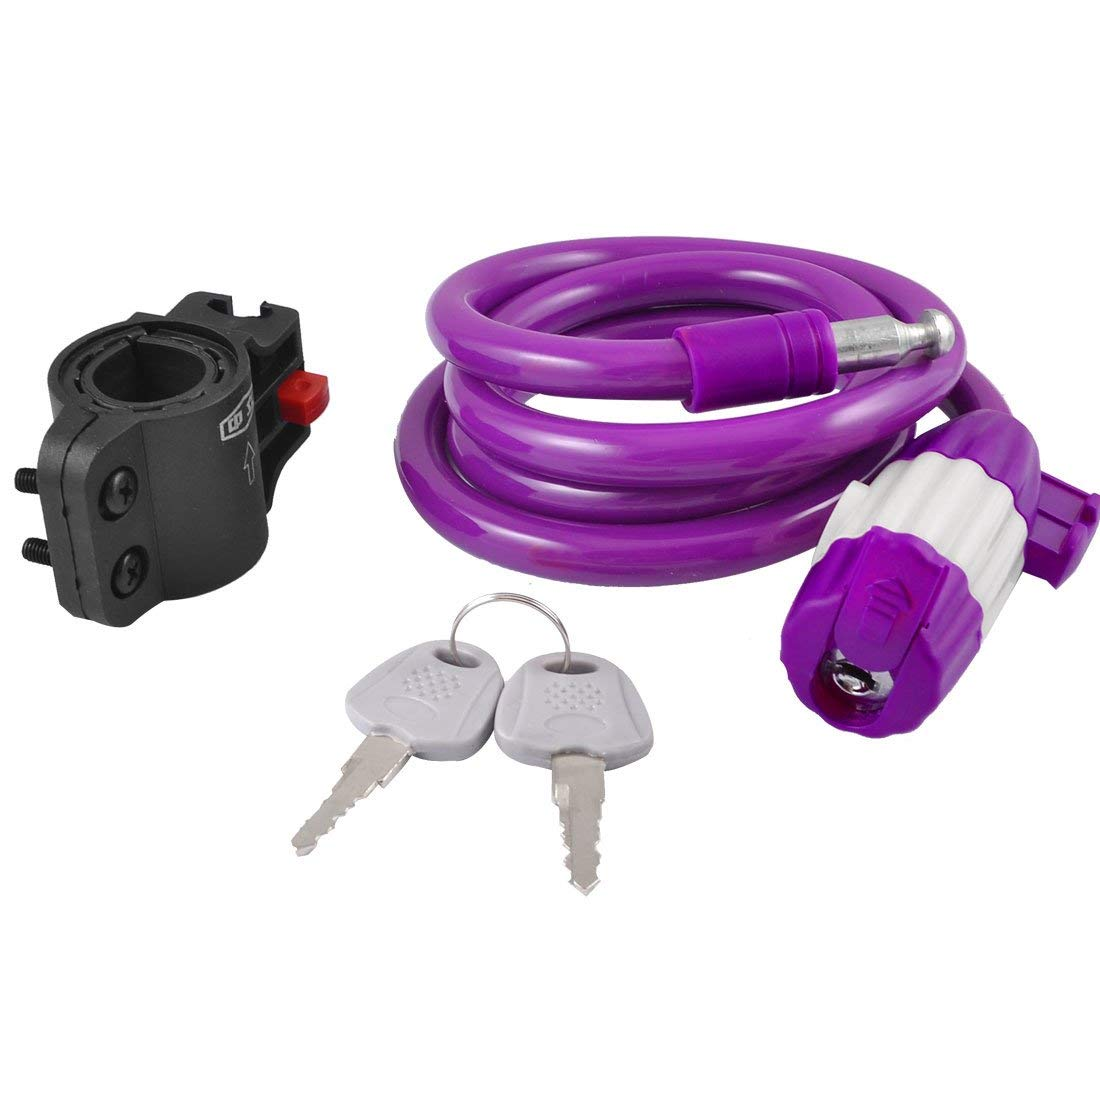 Aexit 3.9Ft 1.2m Bike Locks Purple Bike Motorcycle Safety Steel Wire Coiled Spiral Cable Lock U-Locks w Bracket